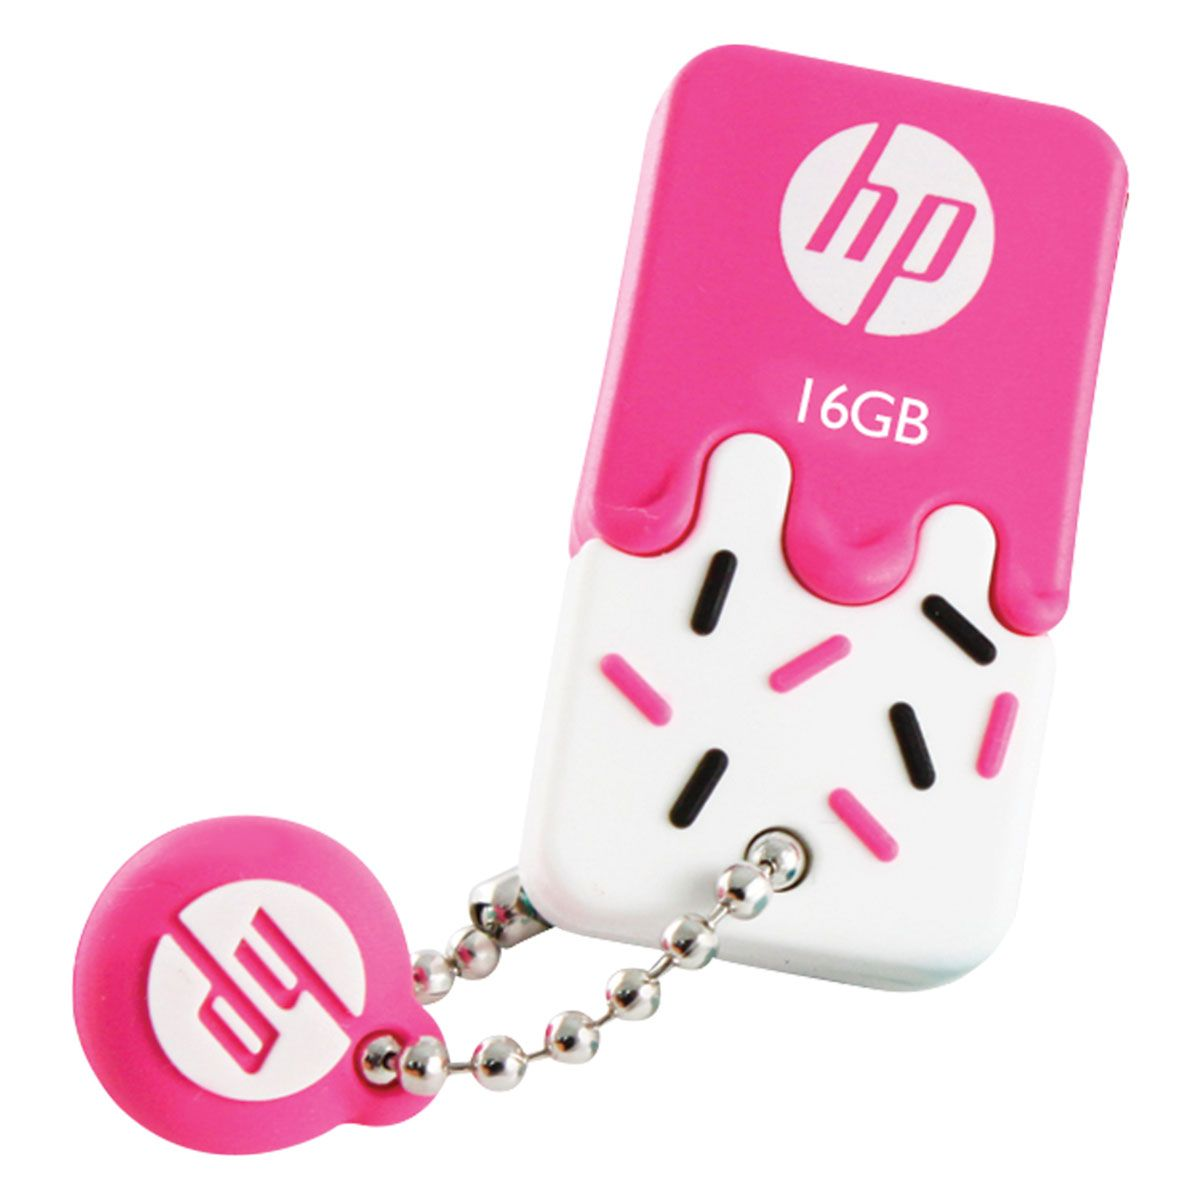 PEN DRIVE MINI HP USB 2.0 V178P 16GB PINK HPFD178P-16